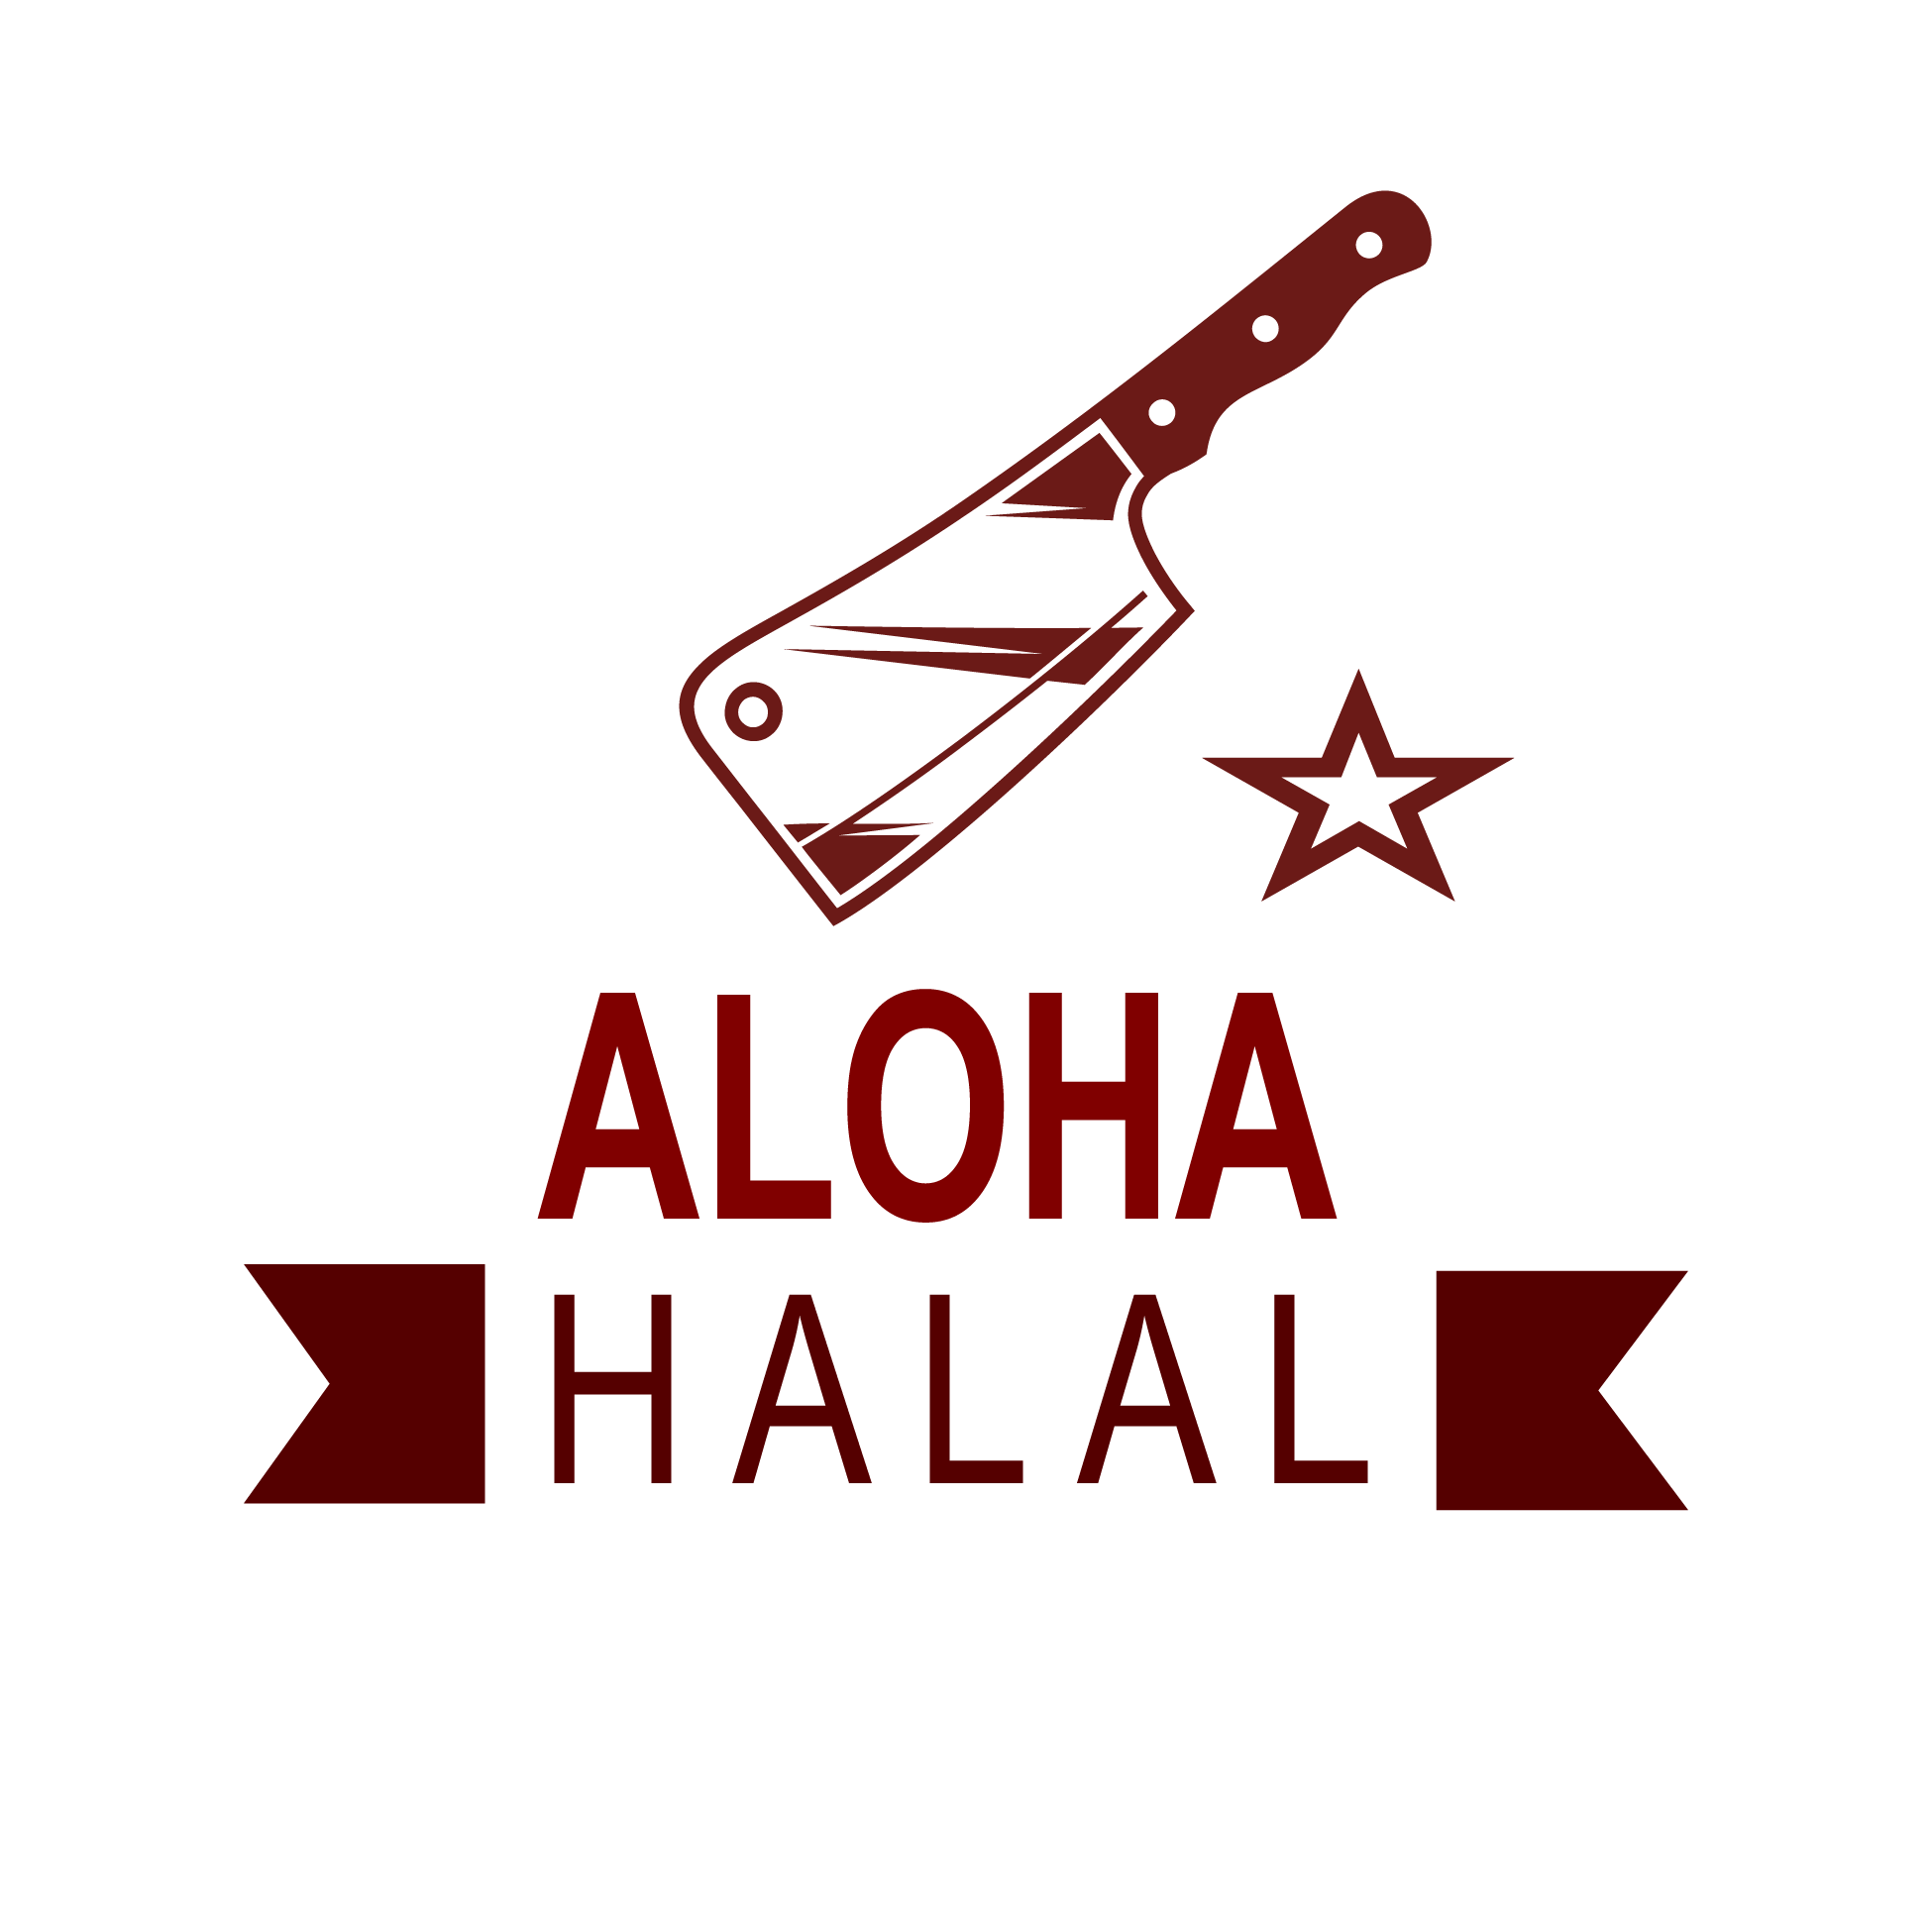 Aloha Halal logo